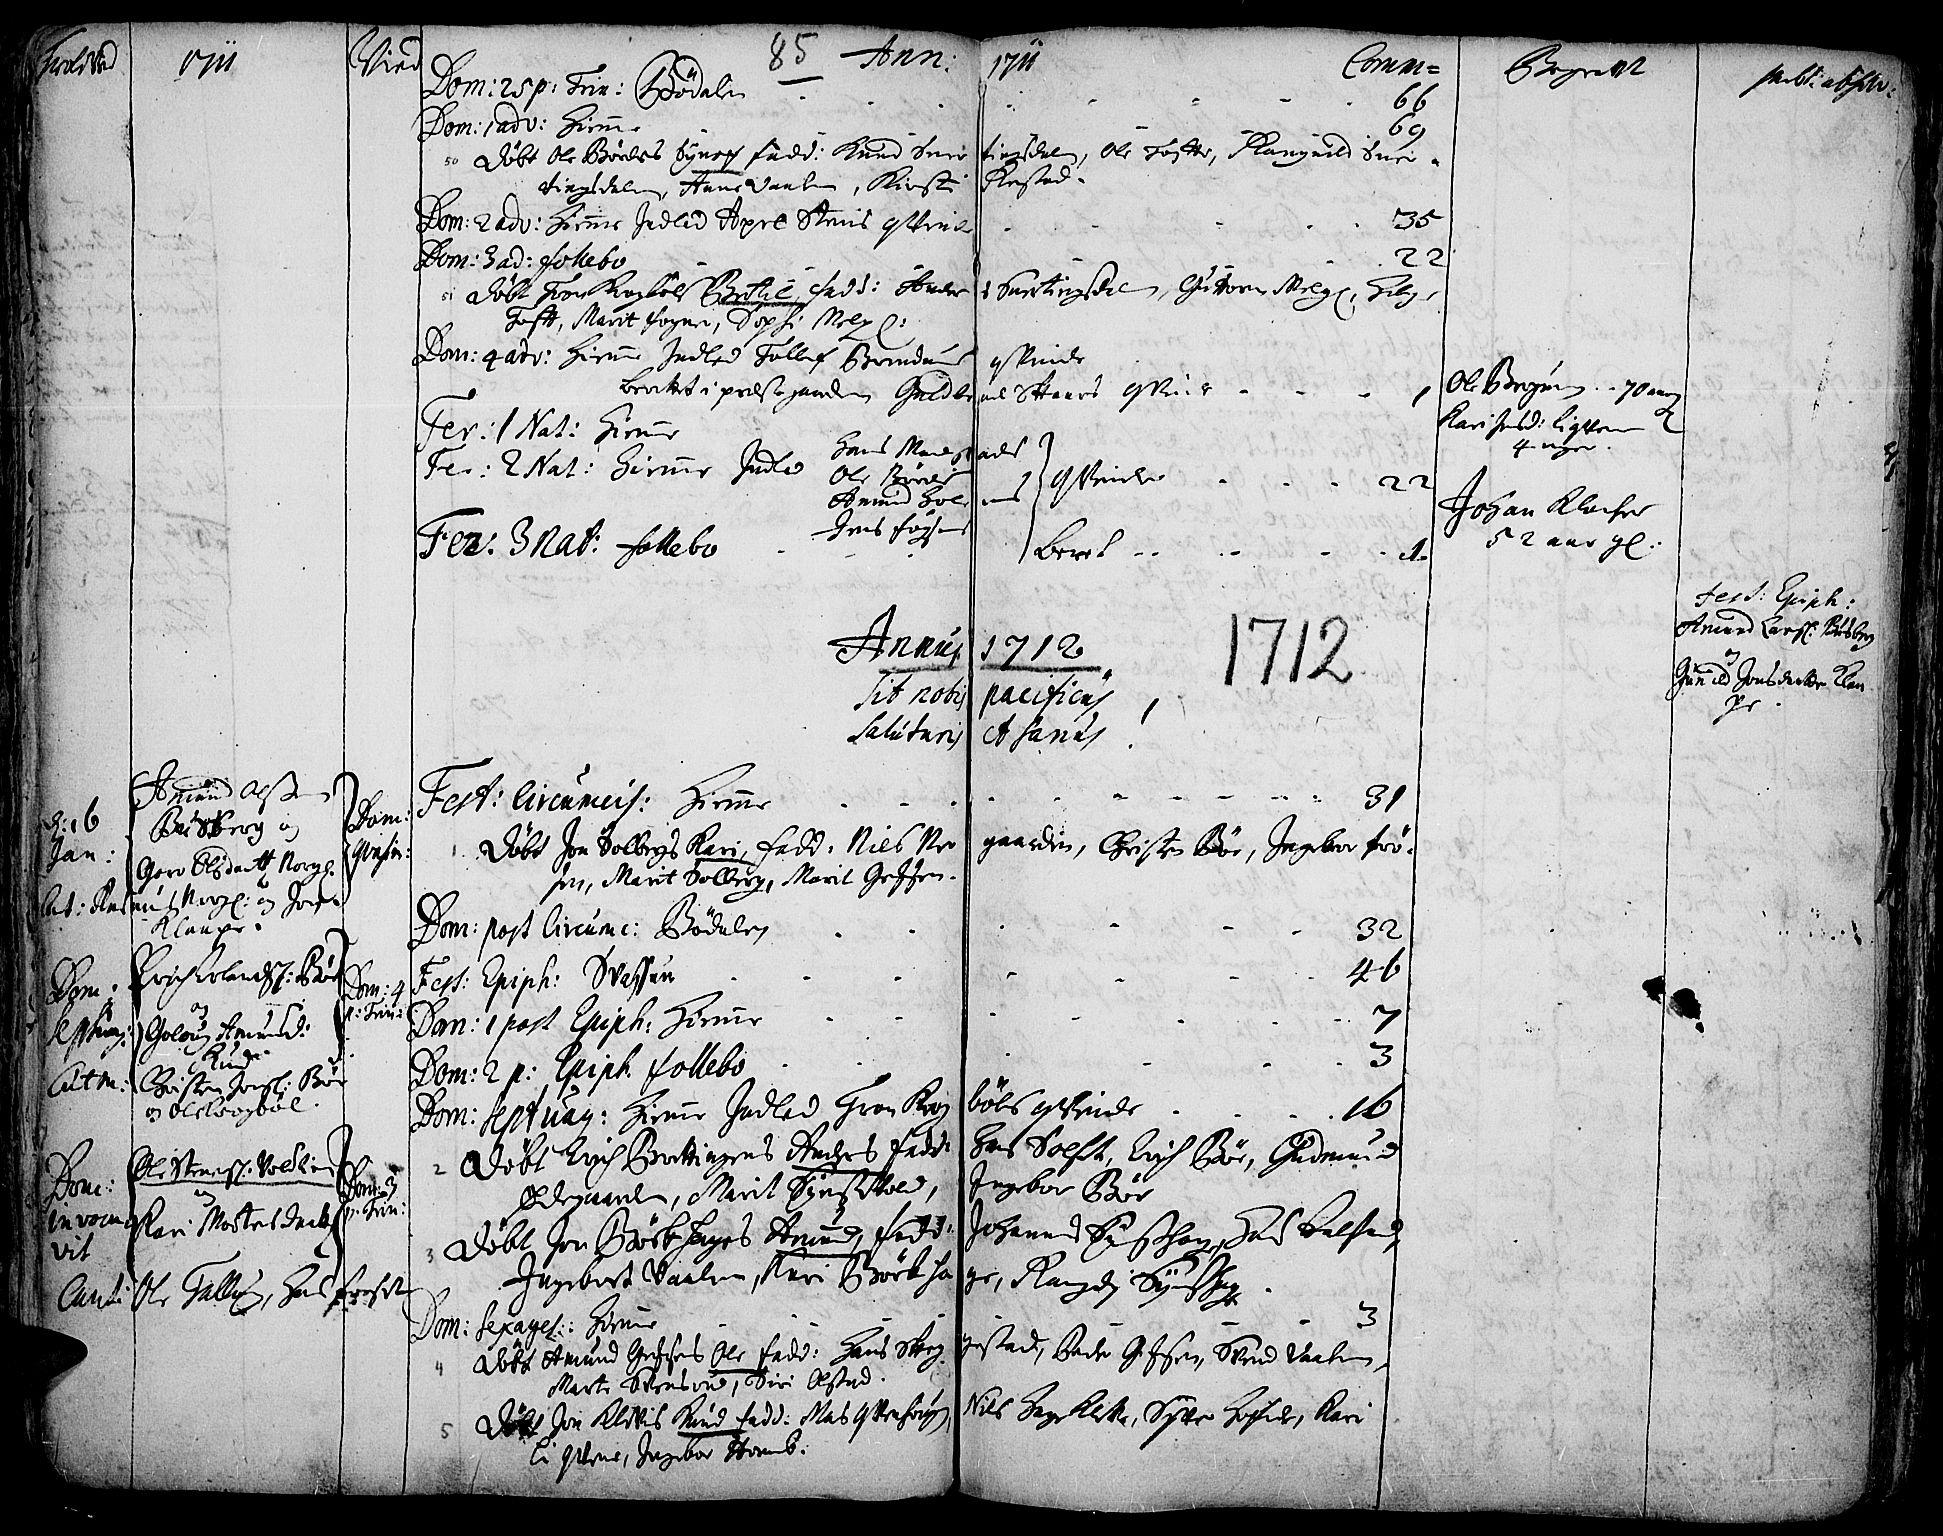 SAH, Gausdal prestekontor, Ministerialbok nr. 1, 1693-1728, s. 85